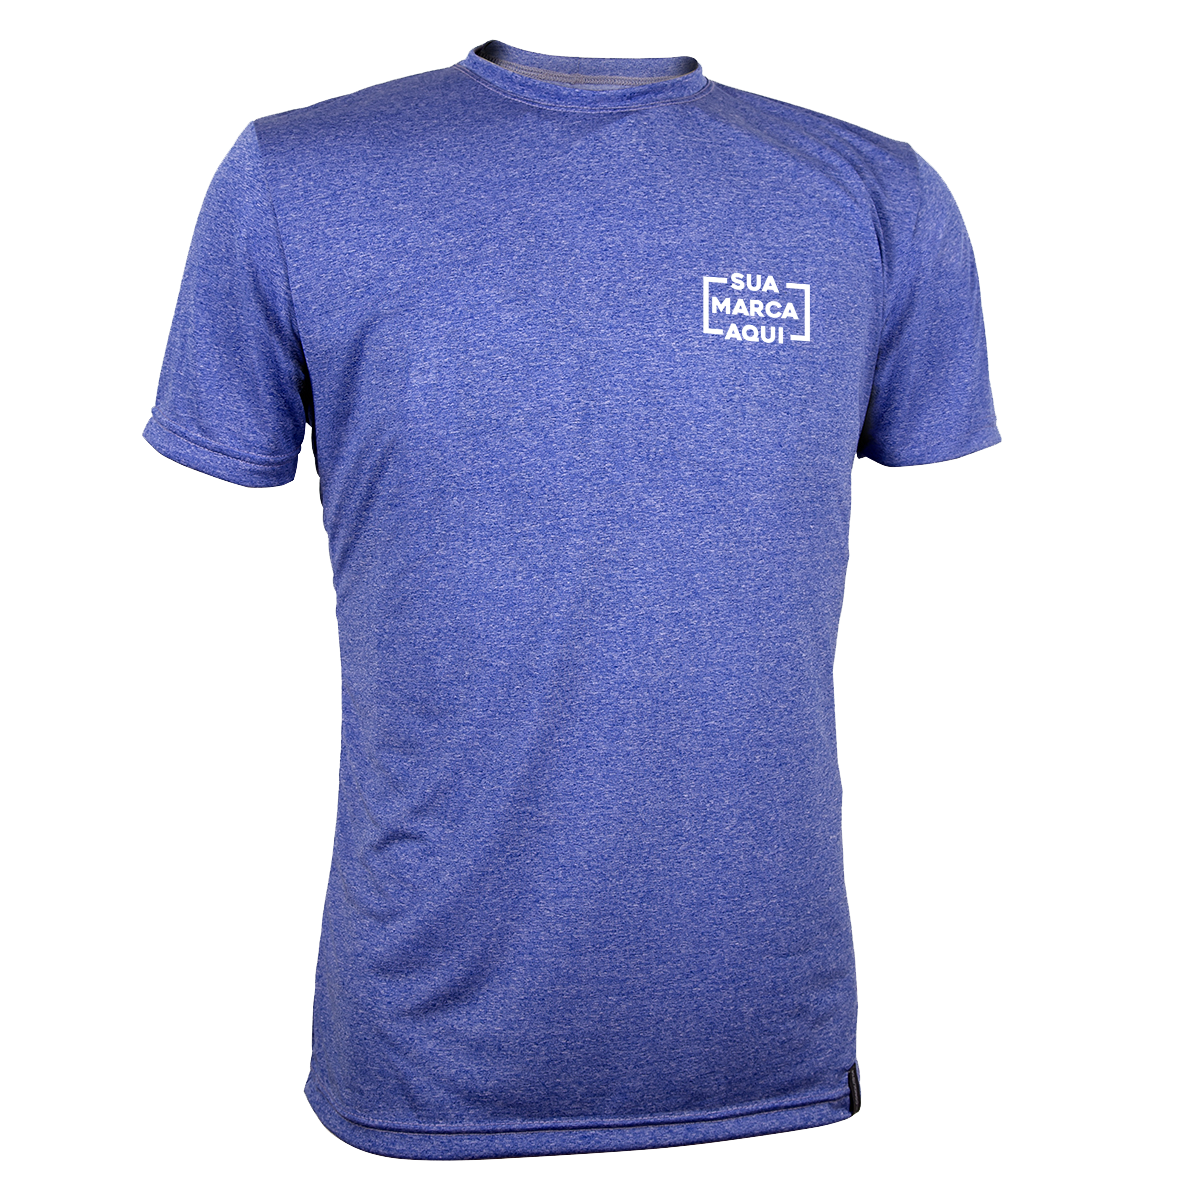 6332f1e26c Camiseta Dry Living Manga Curta Masculina Conquista